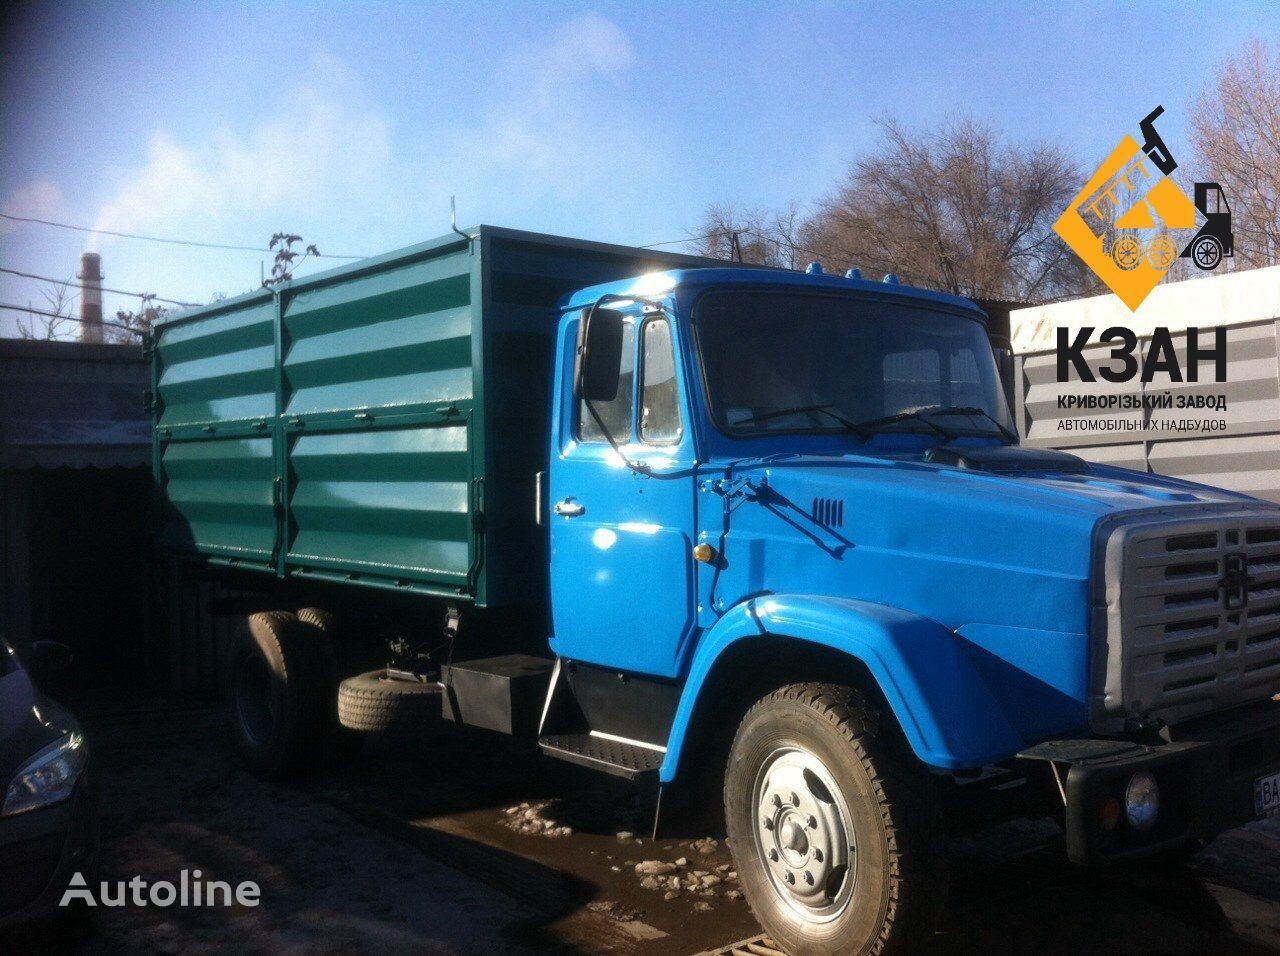 new ZIL Gazon, Gaz, Valday dump truck body